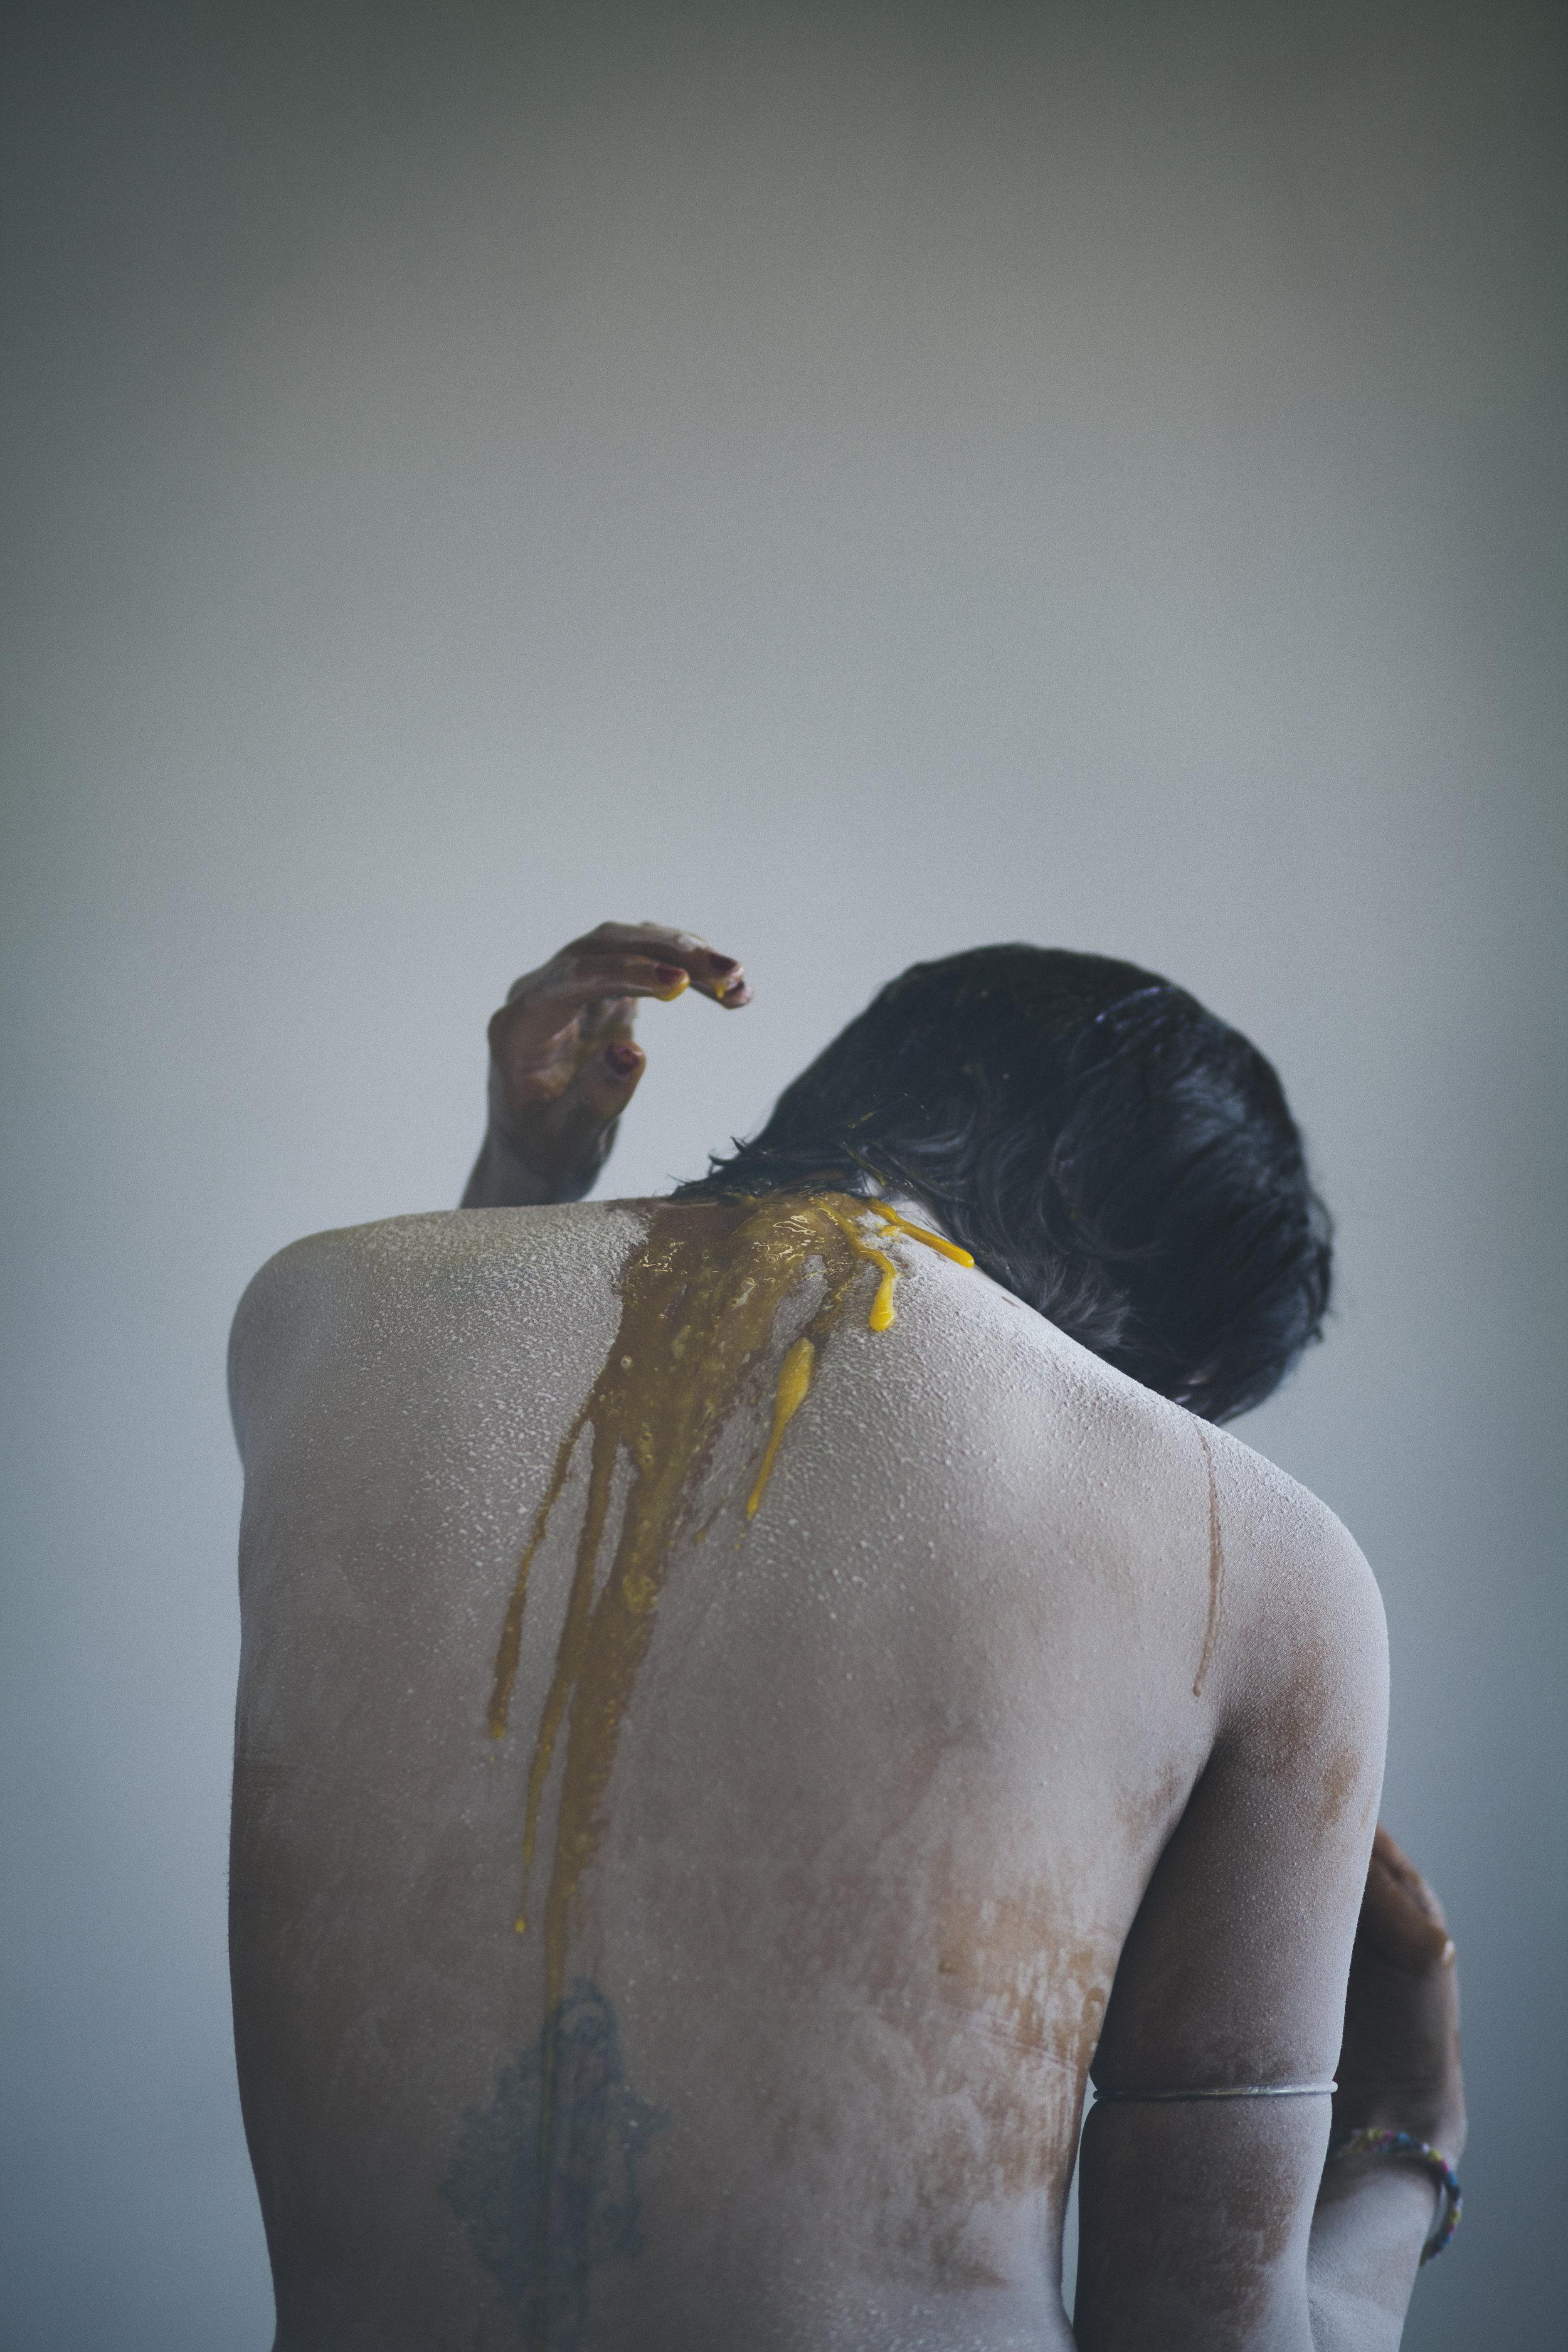 - Daniela Riojas(U.S.A., b. 1989)Limpia 1, 2014 Digital photograph, 34 x 24 inches Courtesy of the artistDownload (JPG)